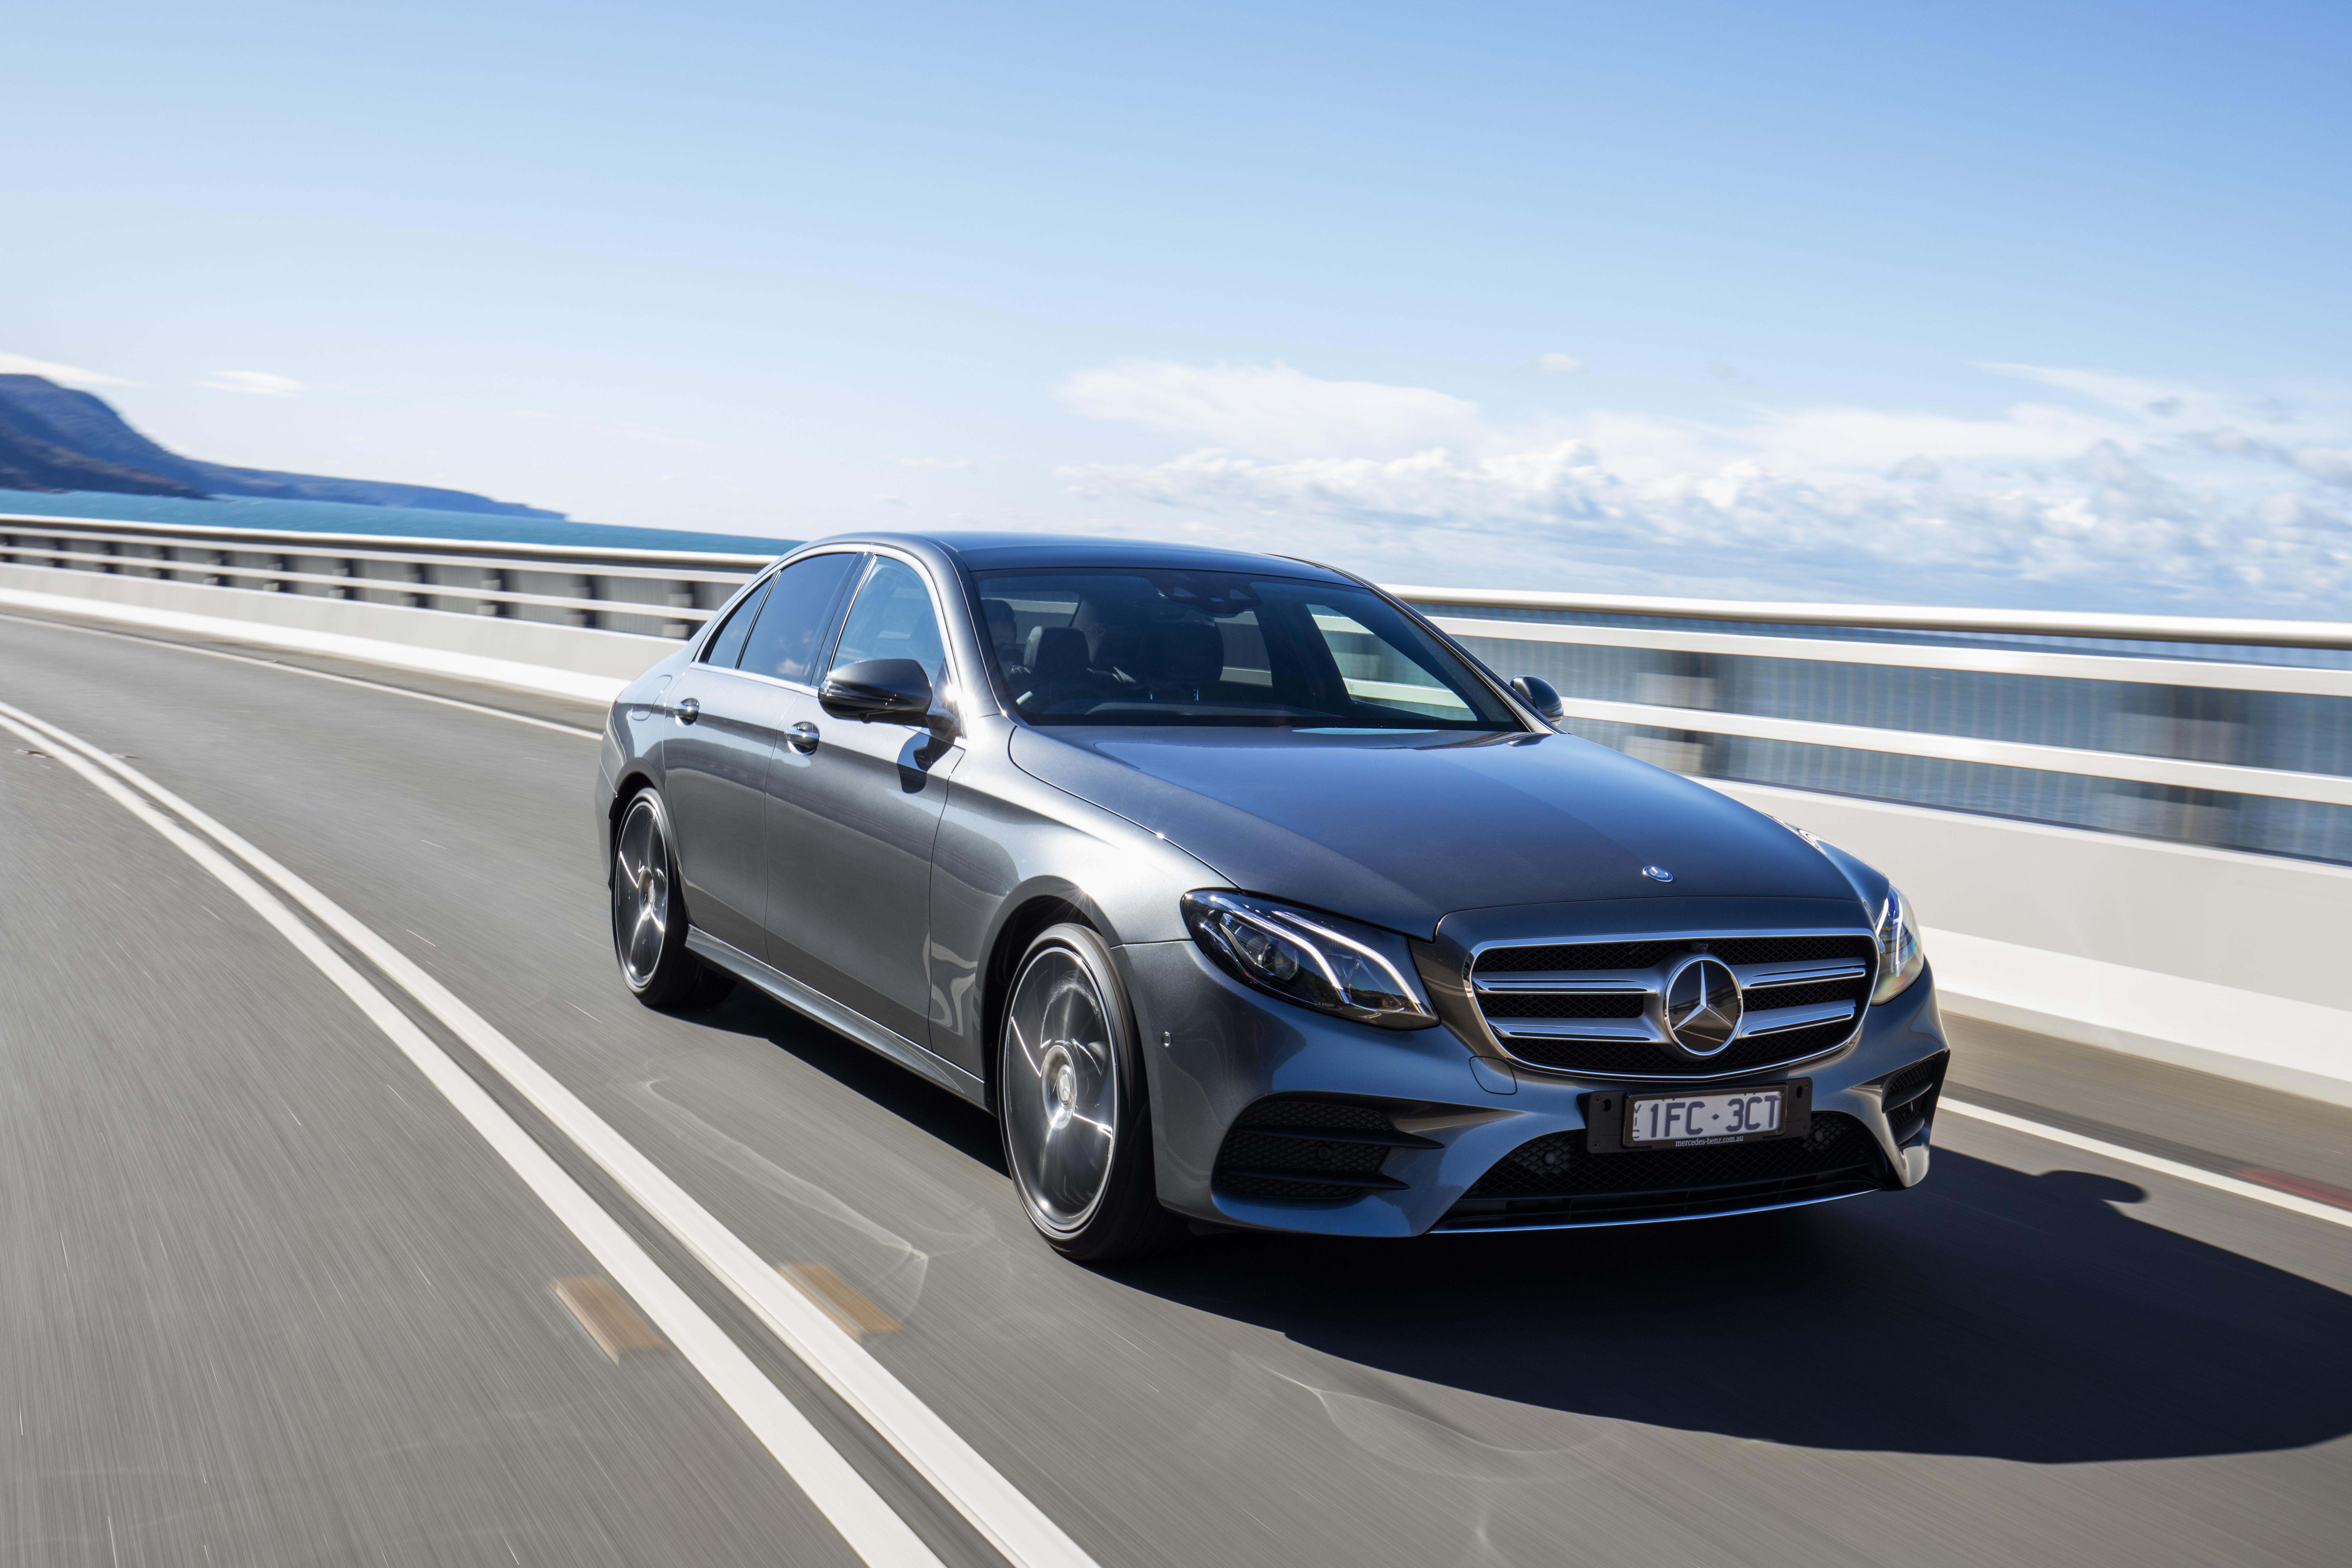 NSW government to trial semi-autonomous cars